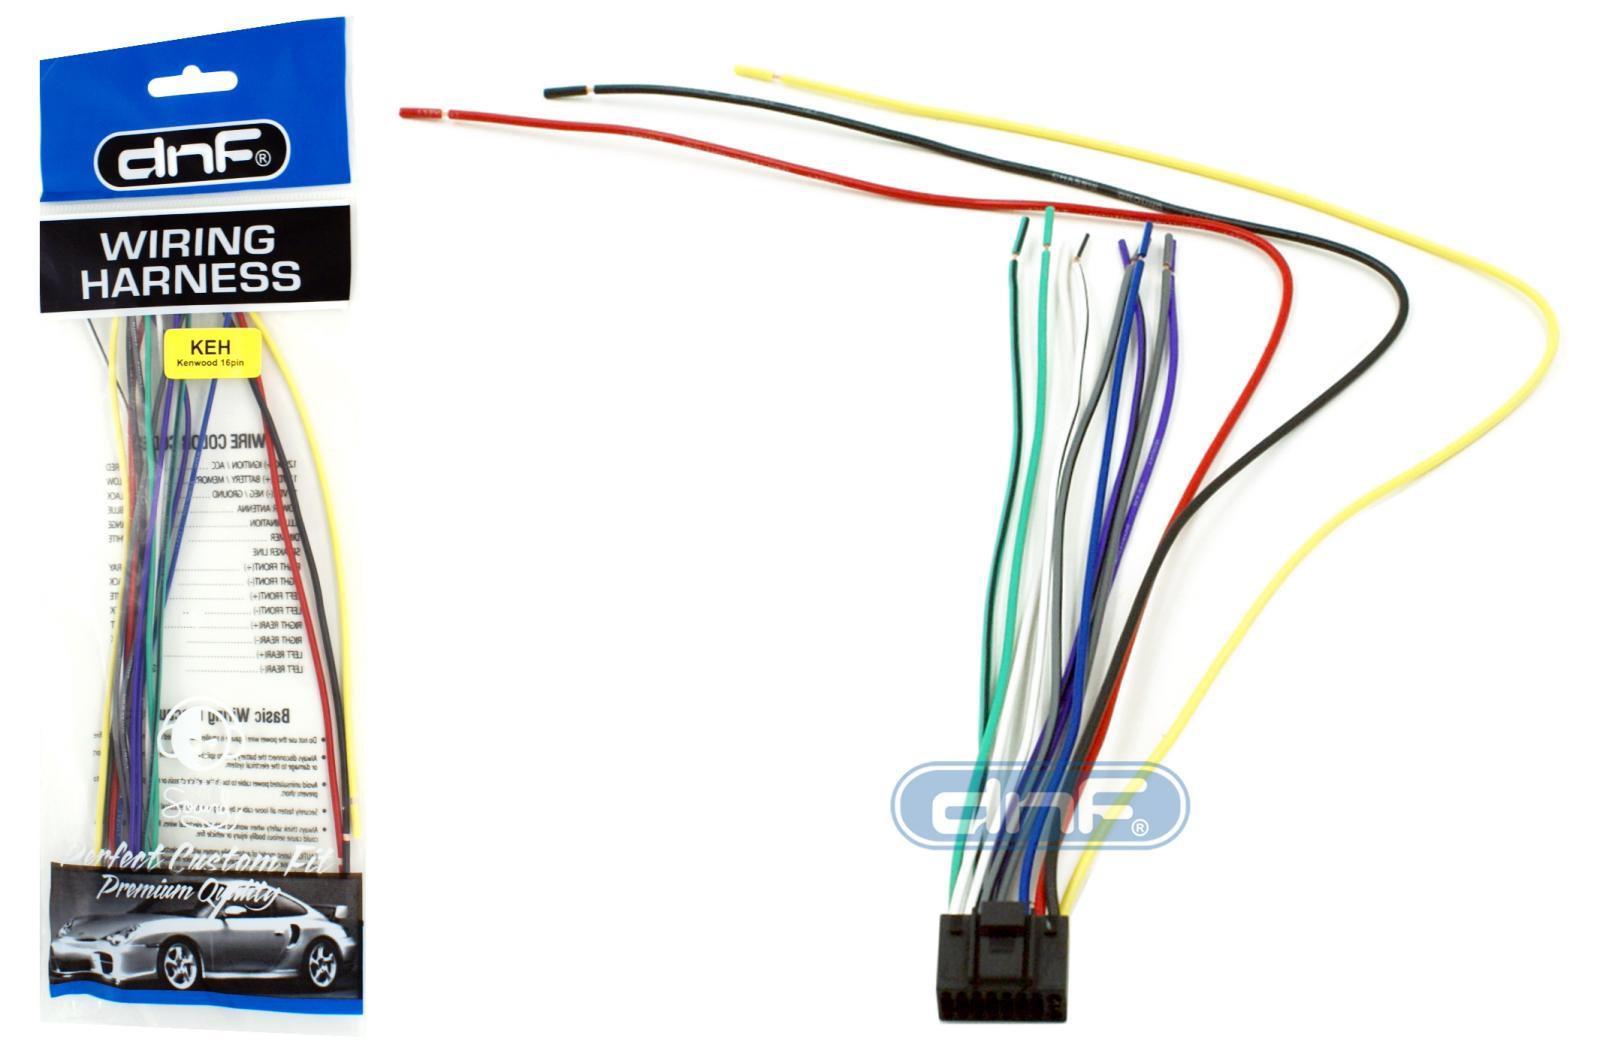 Wg 6823 Kenwood Kdc 352u Wiring Harness Wiring Diagram